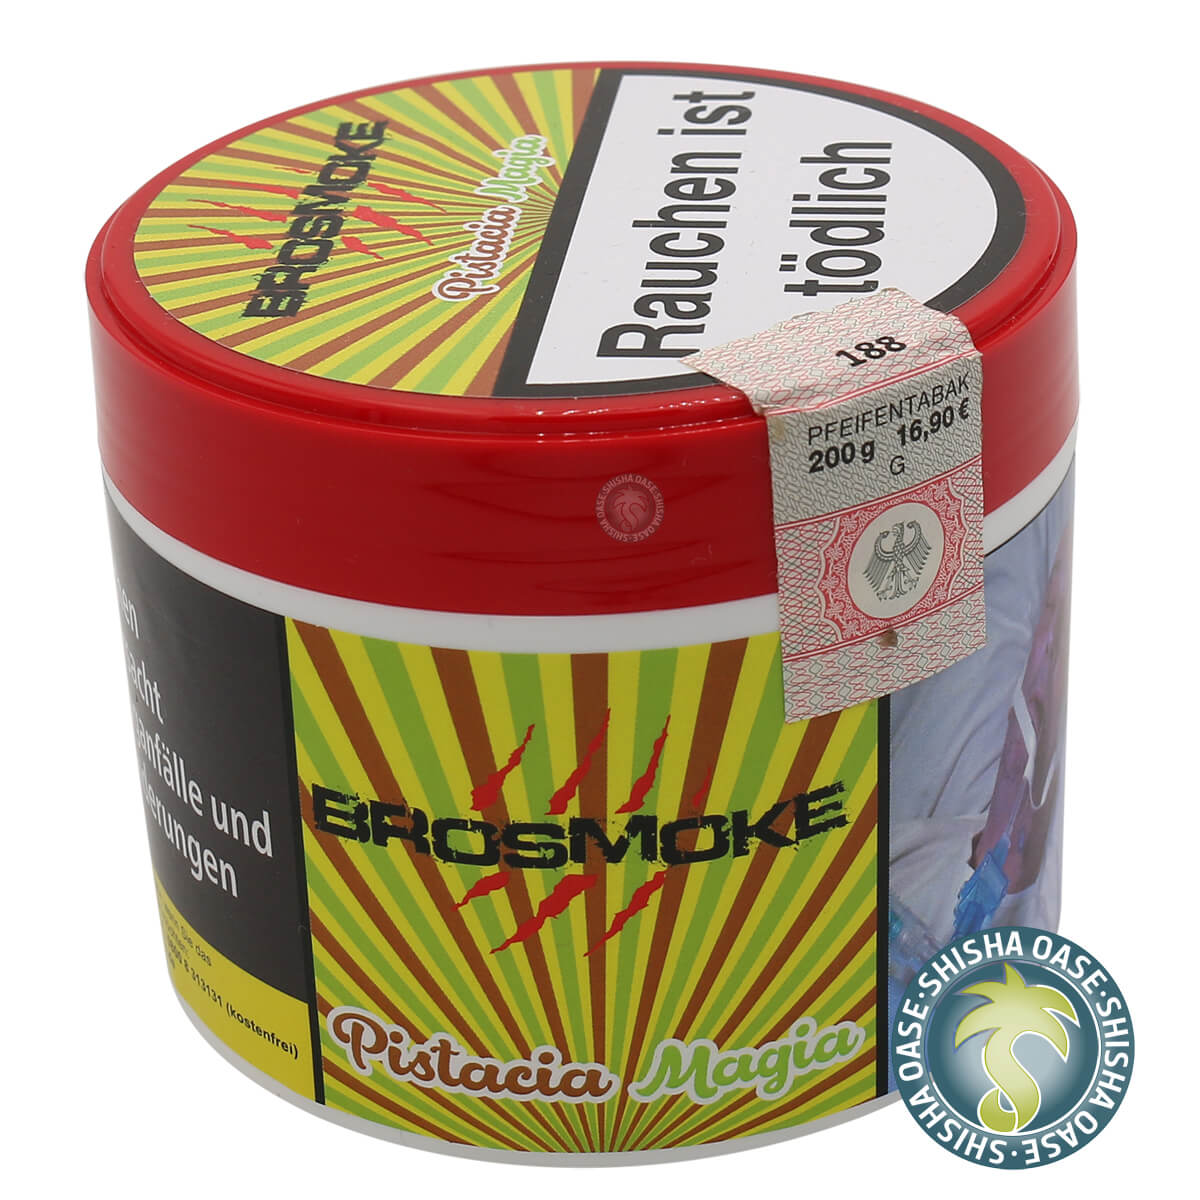 Brosmoke Tabak 200g Dose | Pistacia Magia